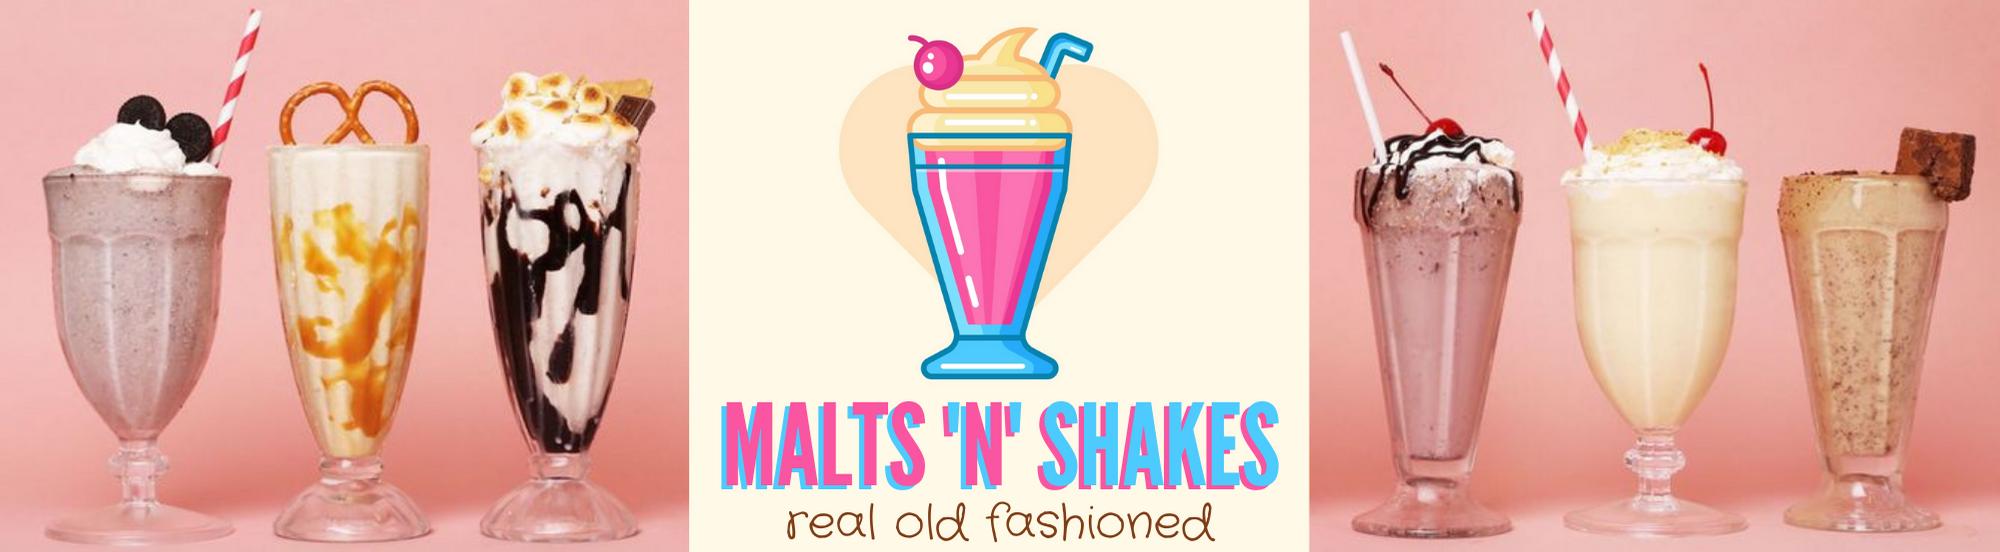 Malts 'n' Shakes